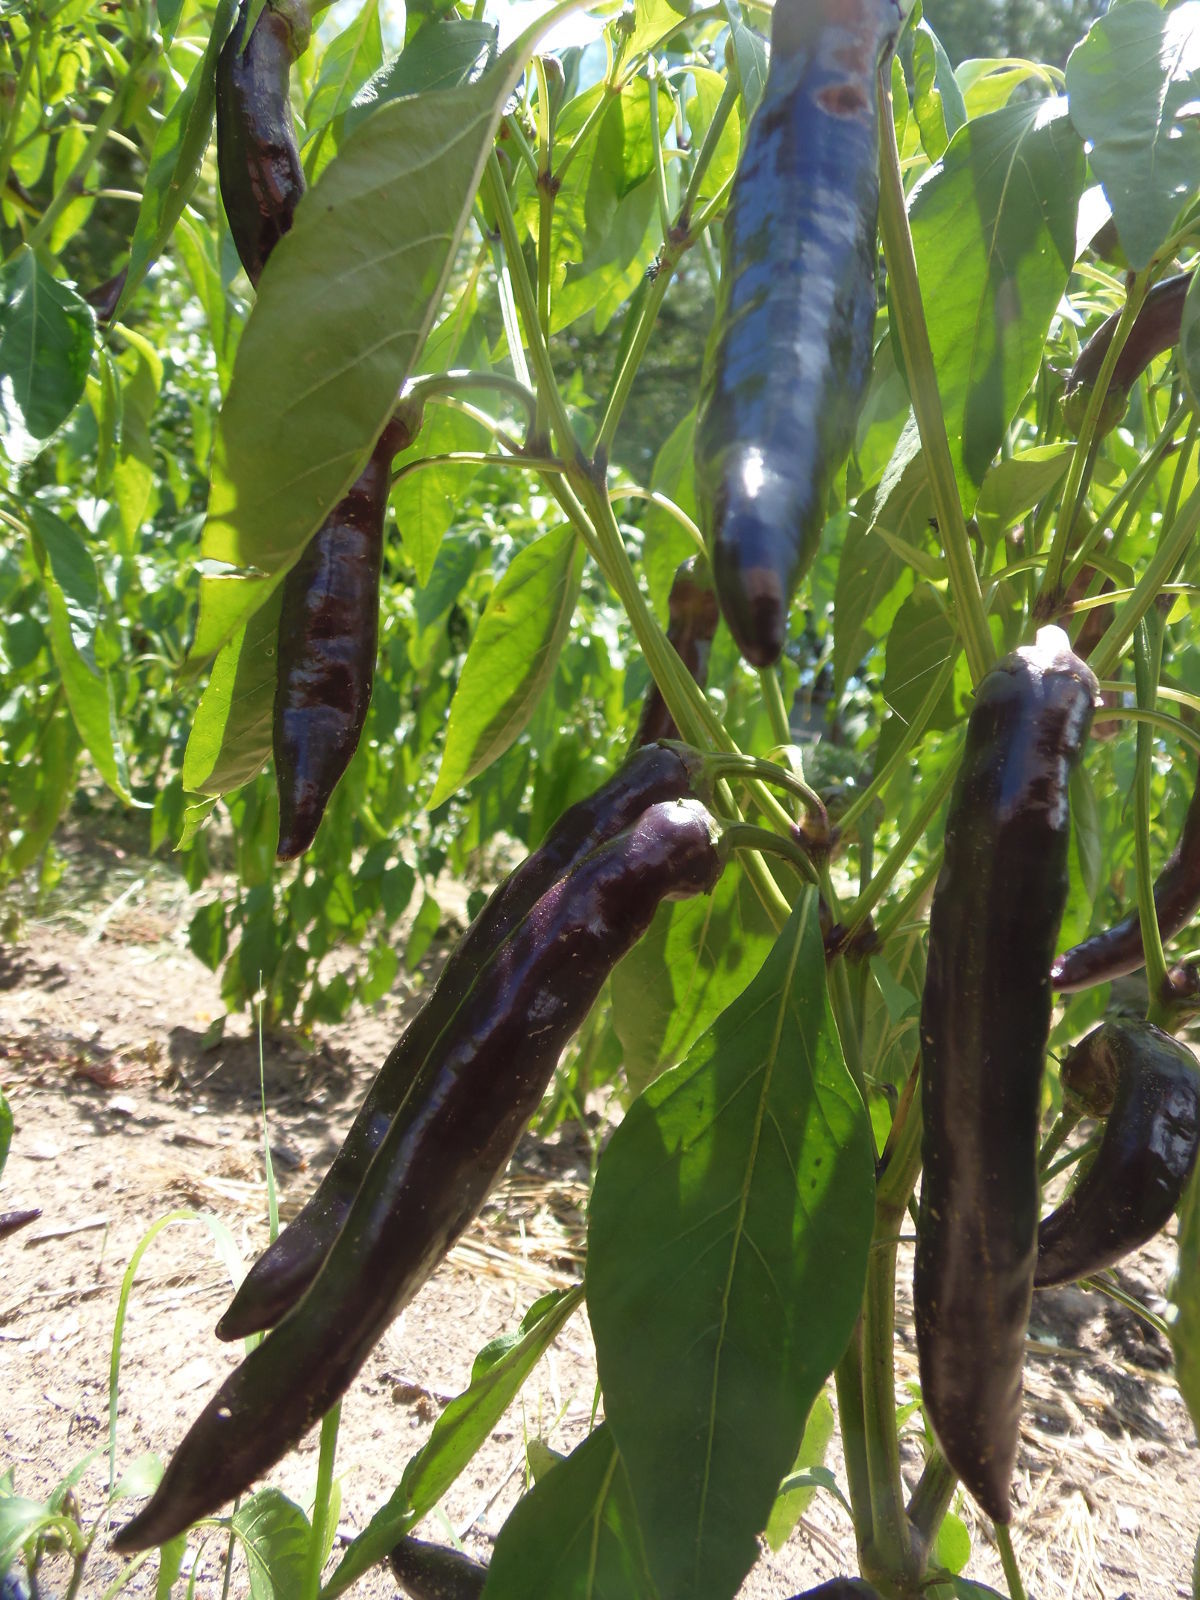 Tasmanian Black Hot Pepper - dark, smoky hot, and very rare pepper